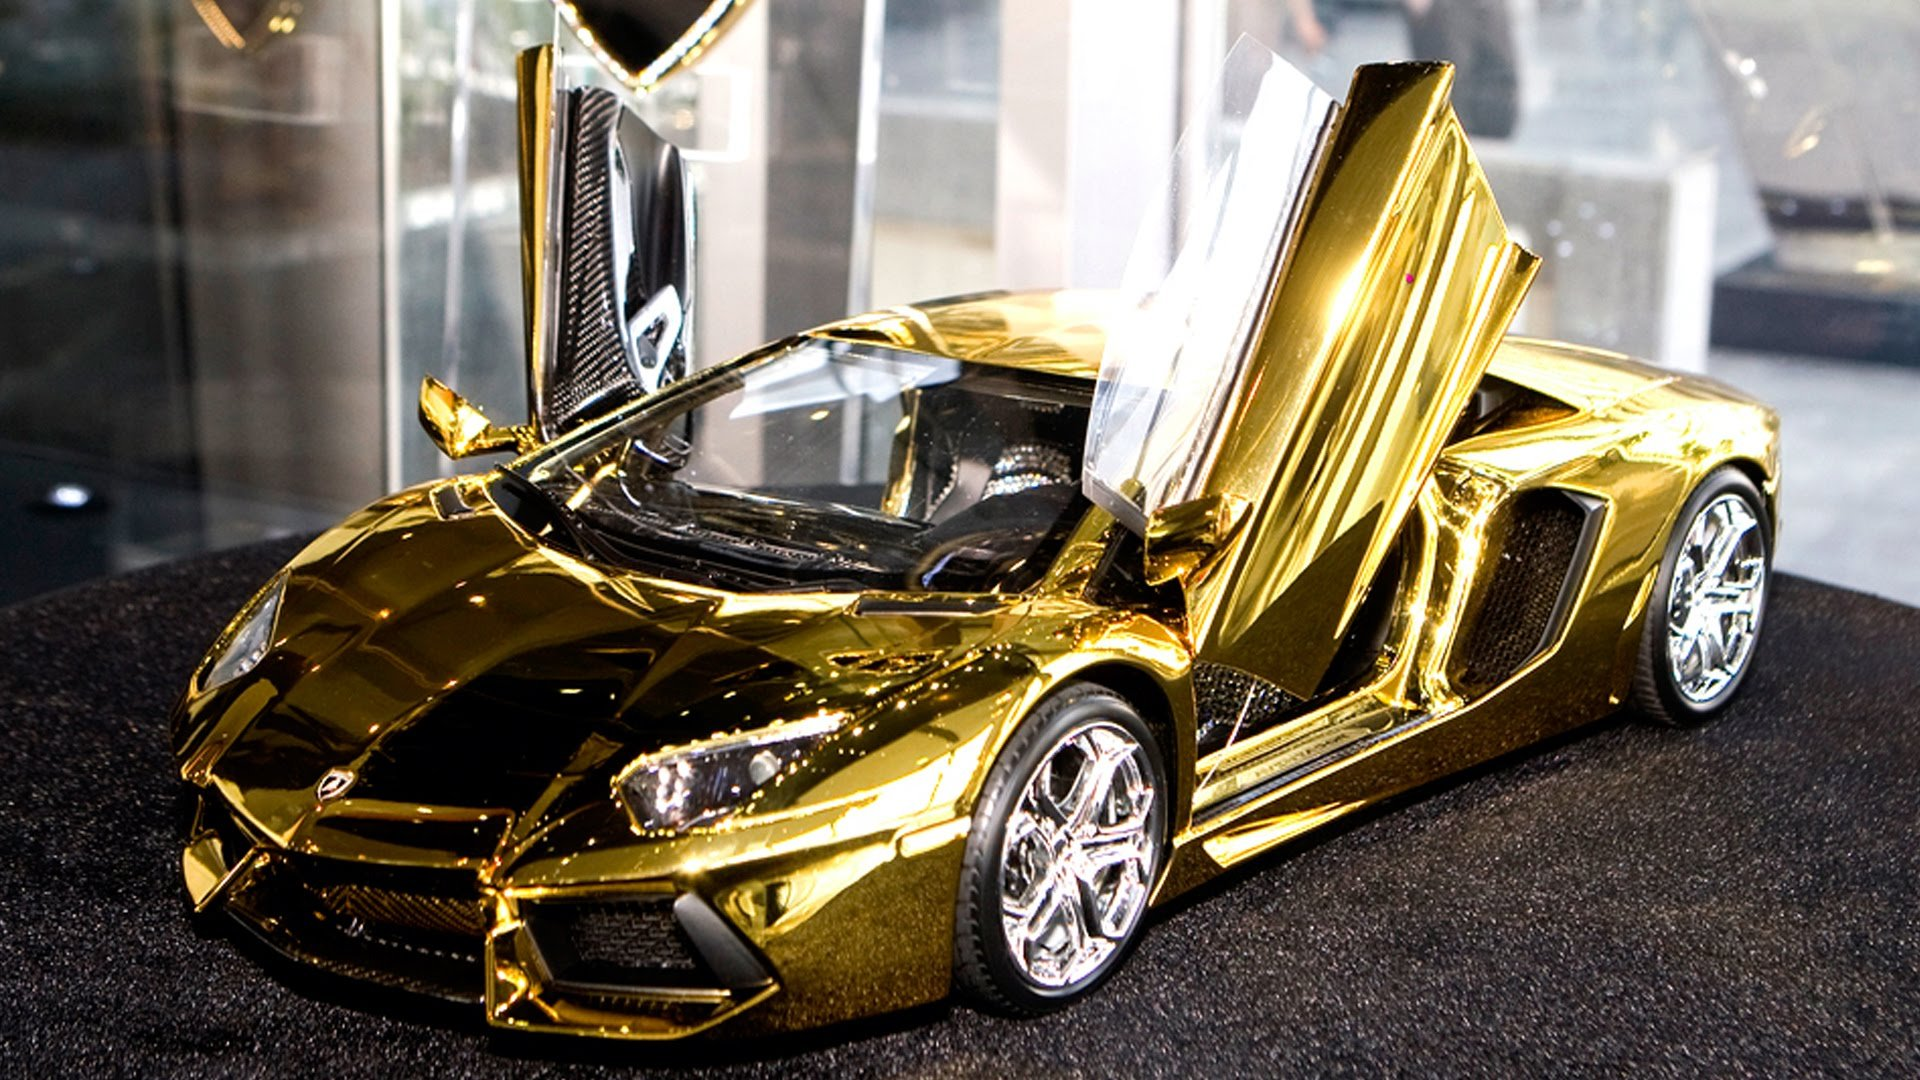 Www Hummer Limousine Car Wallpapers Com Gold Car Hd Wallpaper